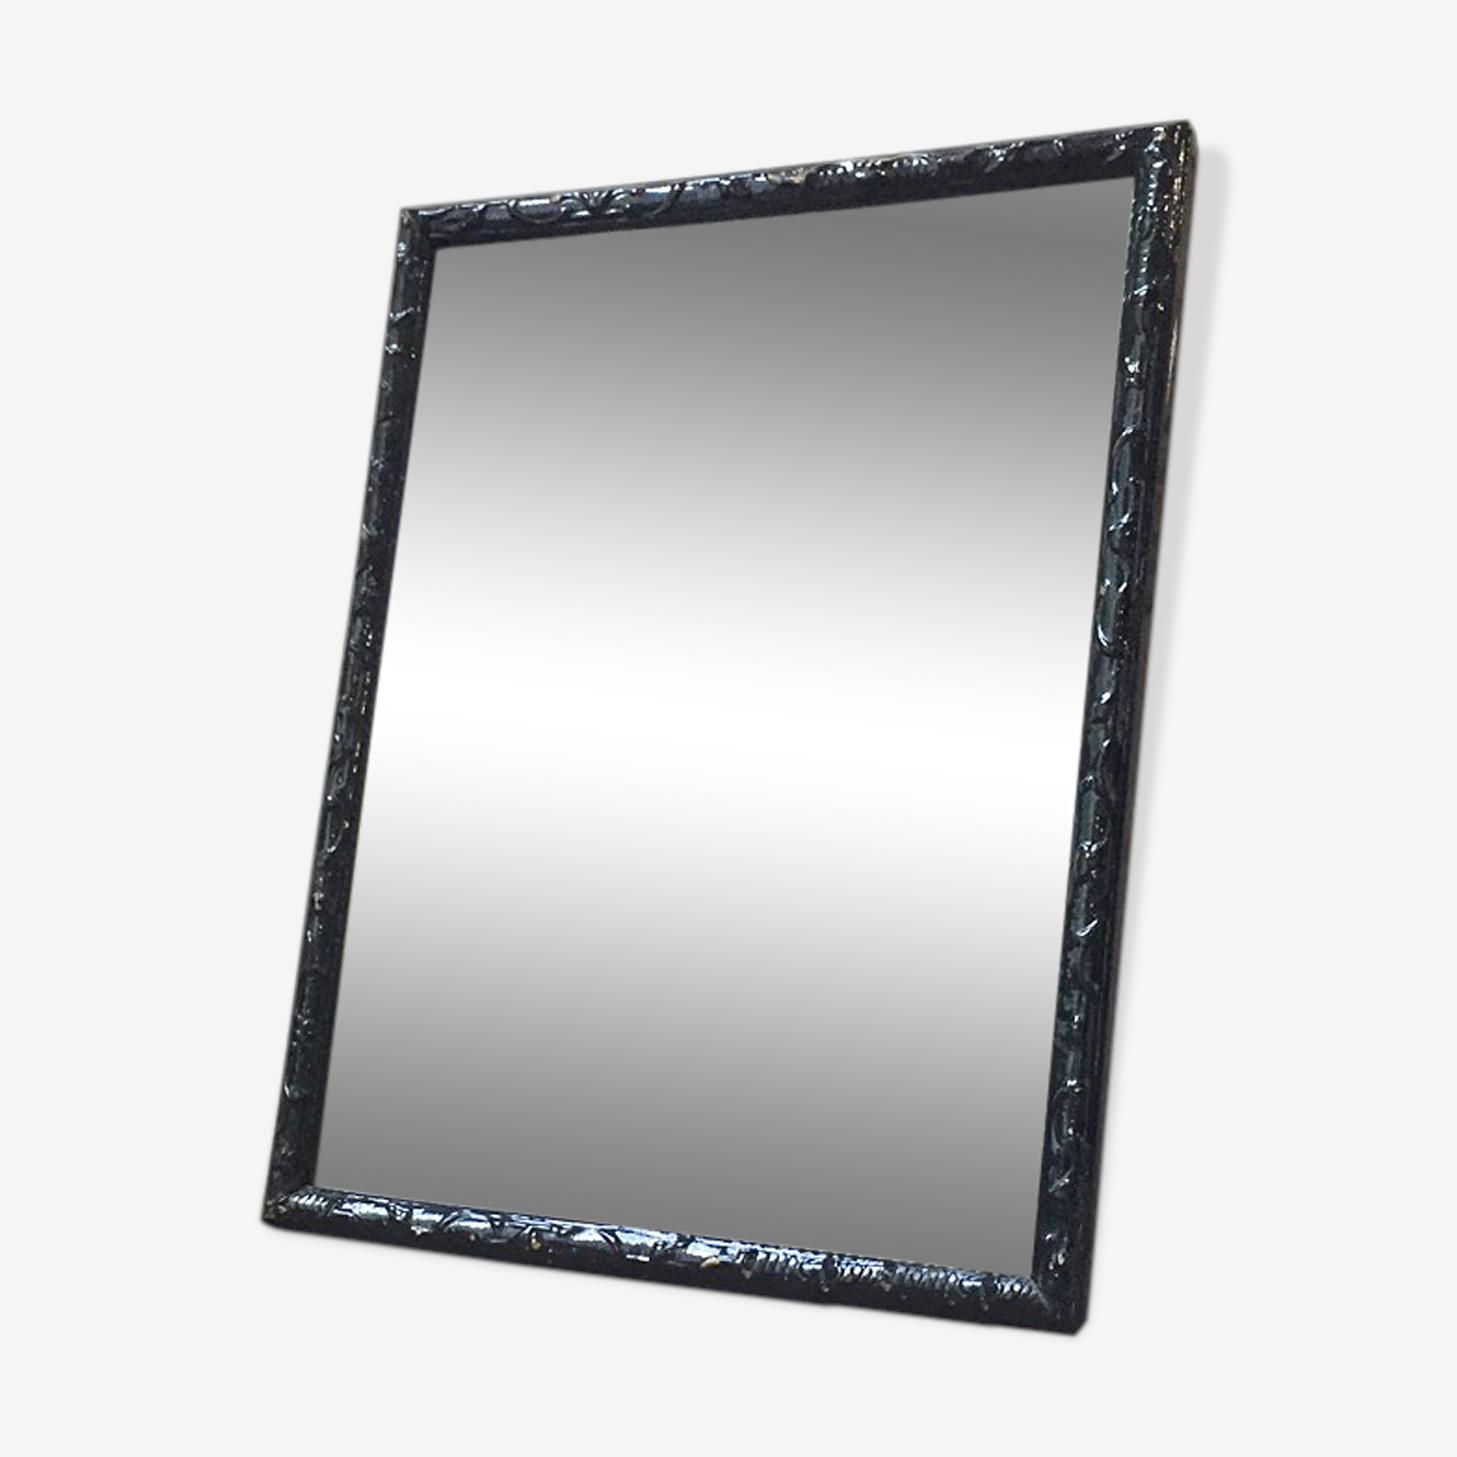 Black rectangle mirror 70 x 54 cm